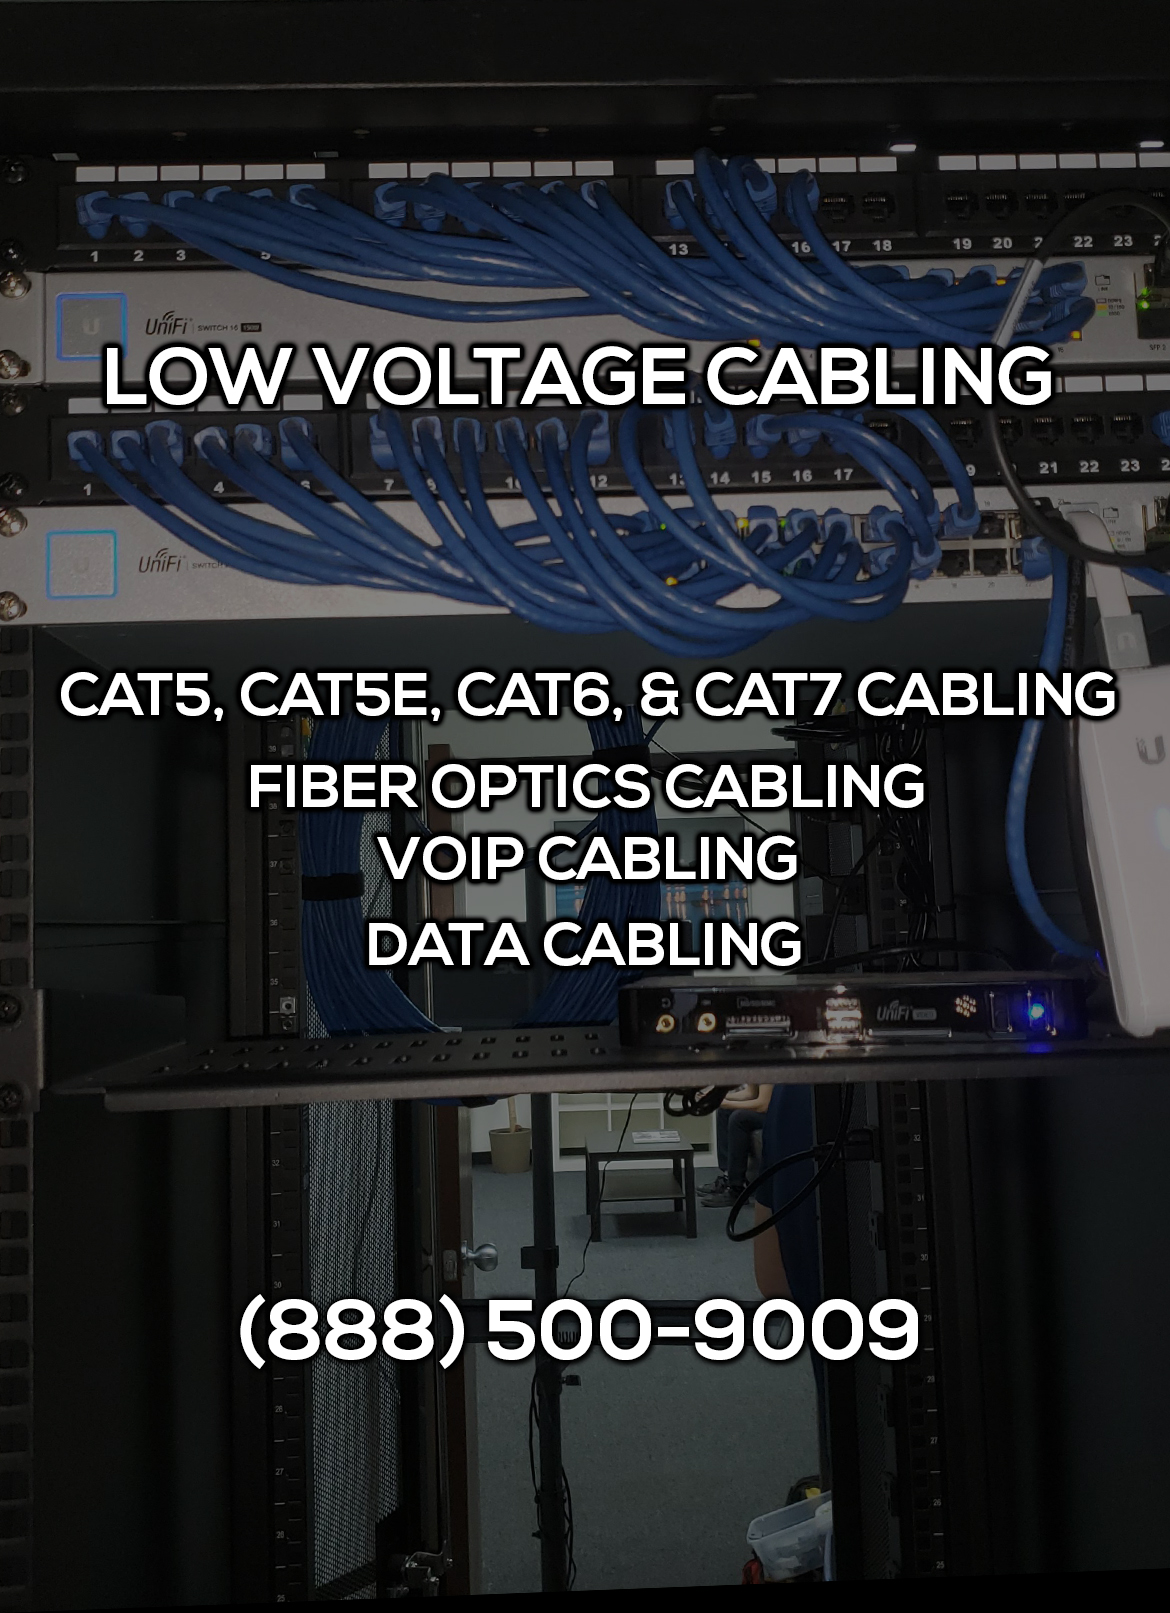 Low Voltage Cabling in Santa Ana